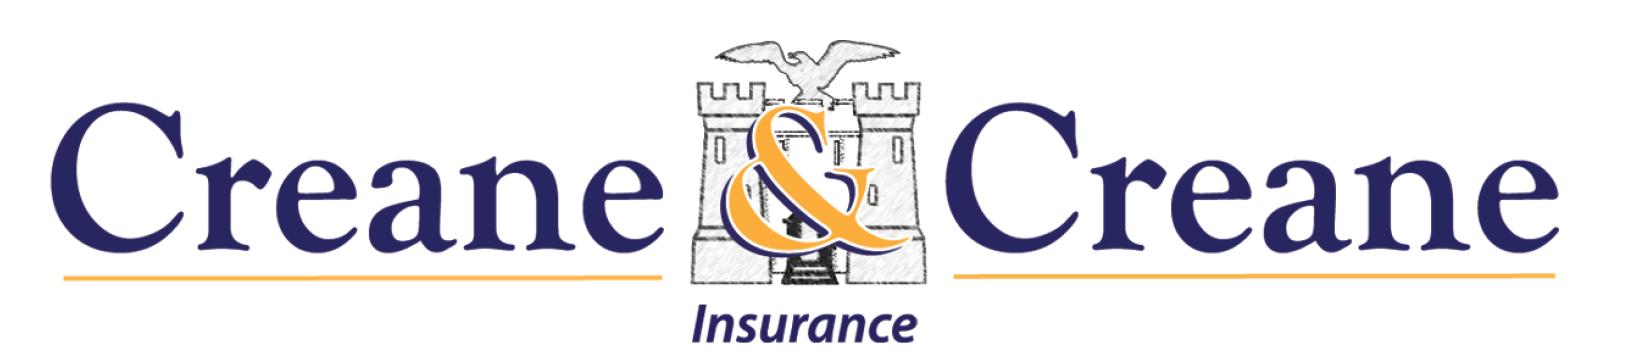 Creane and Creane Insurance